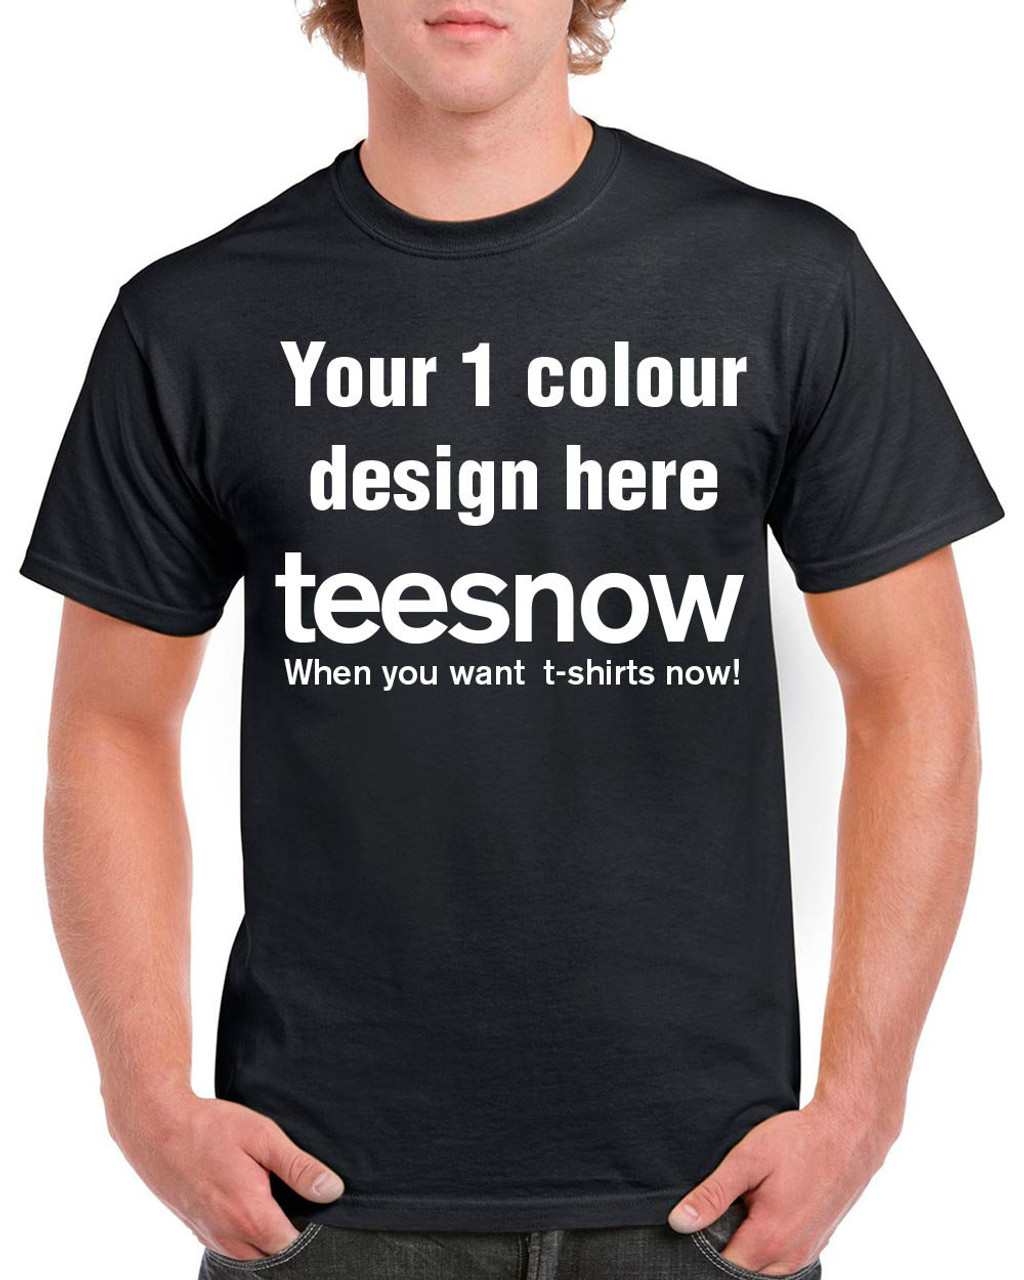 Black t shirt printing - Black T Shirt With 1 Colour Custom Printing On Front